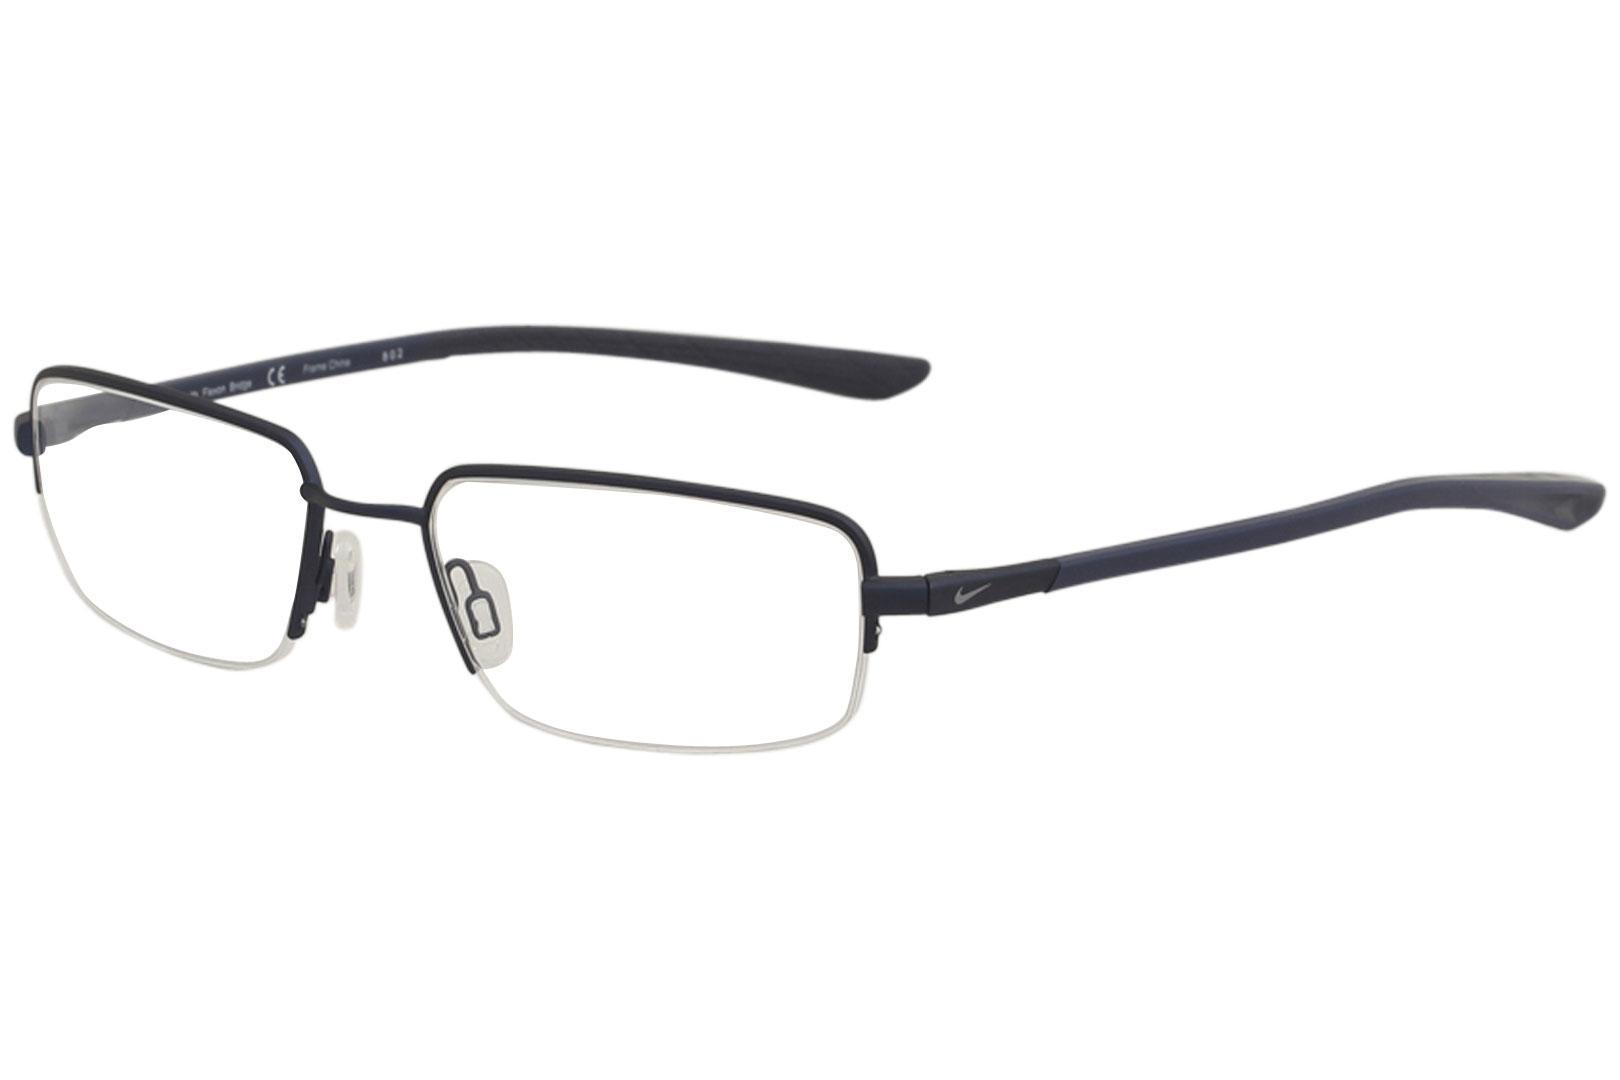 75a334a9d60b Nike Men's Eyeglasses 4287 Half Rim Flexon Optical Frame